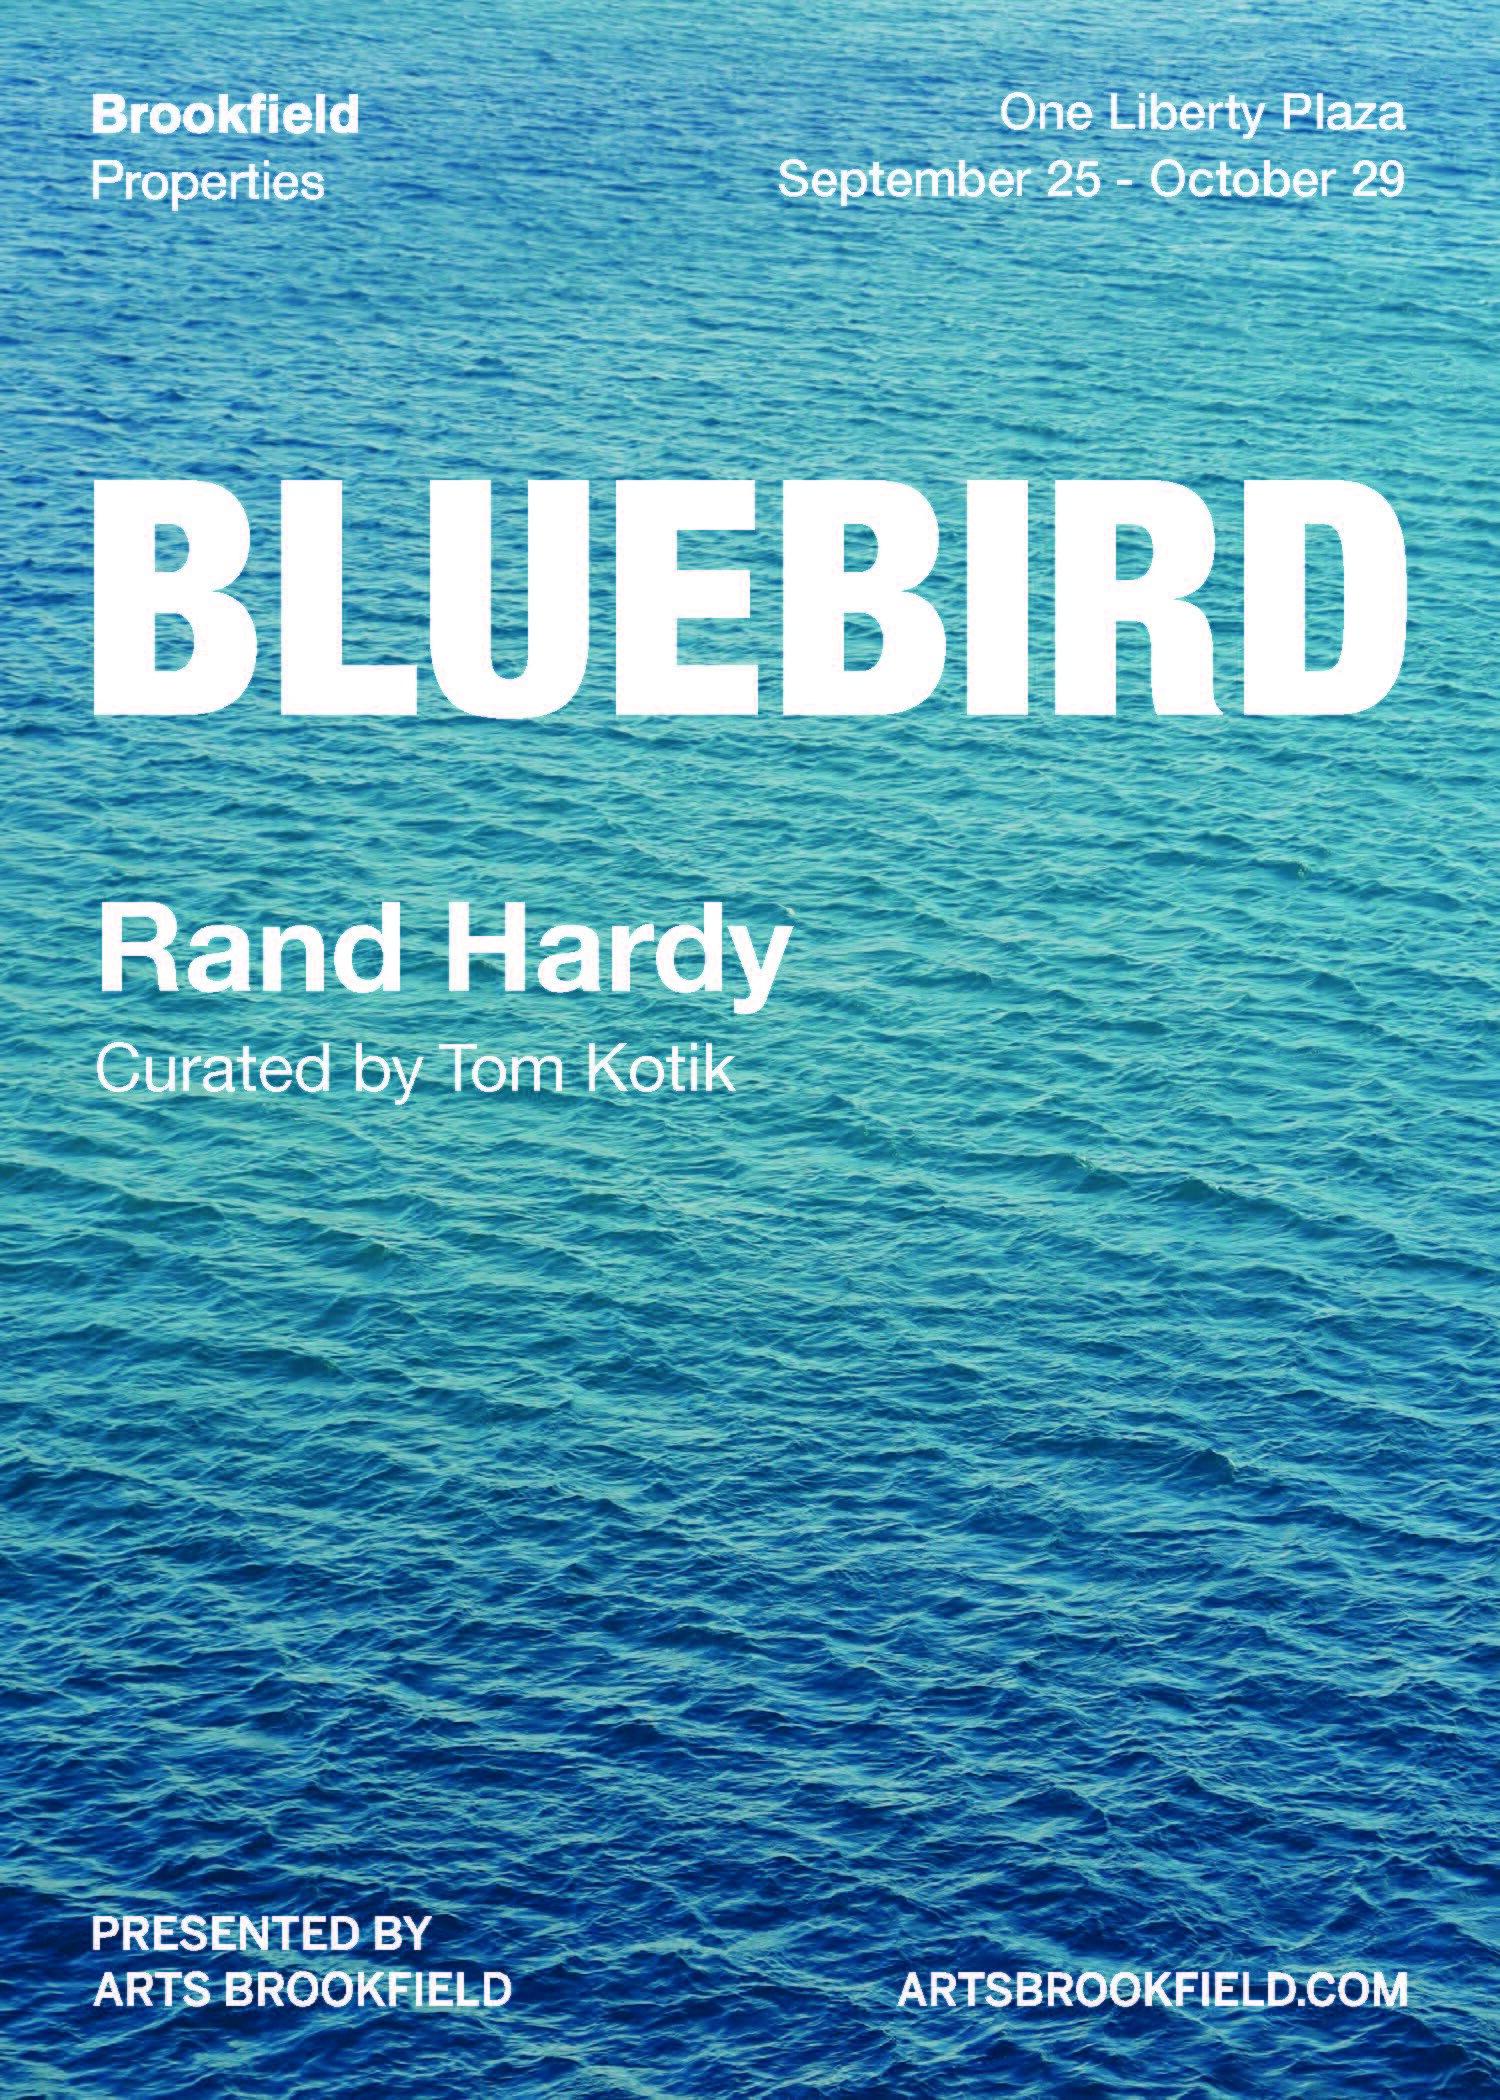 Brookfield Properties_Bluebird_Rand Hardy_OLP_JPG.jpg